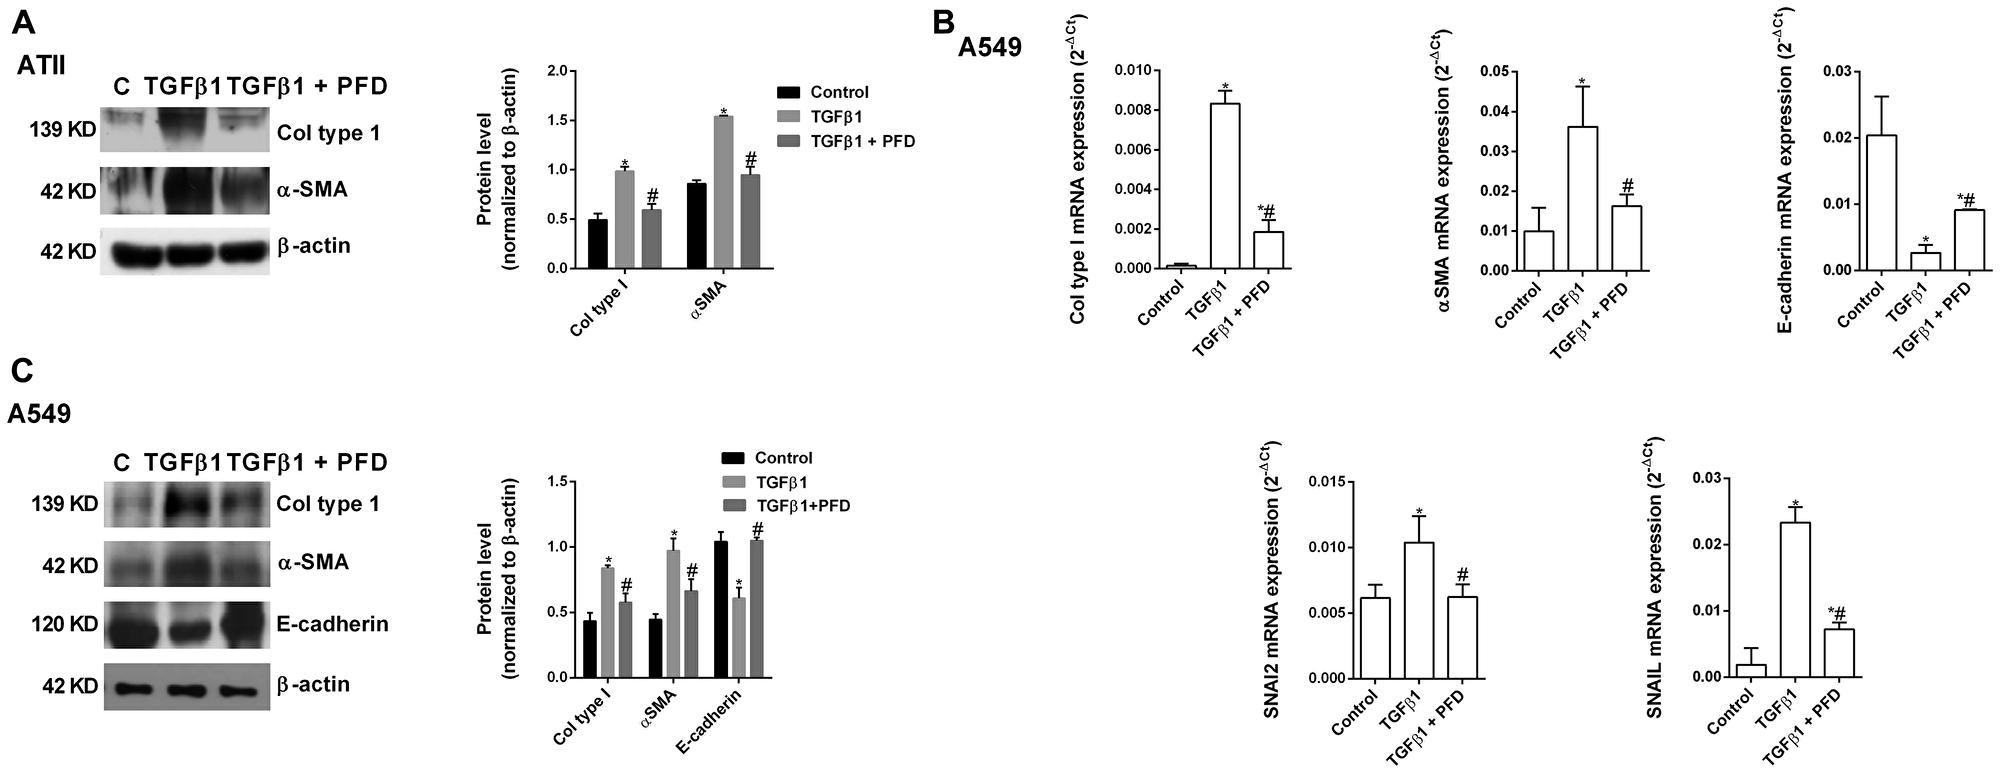 Pirfenidone (PFD) inhibits the TGF-β1-induced alveolar type II (ATII) to mesenchymal transition.